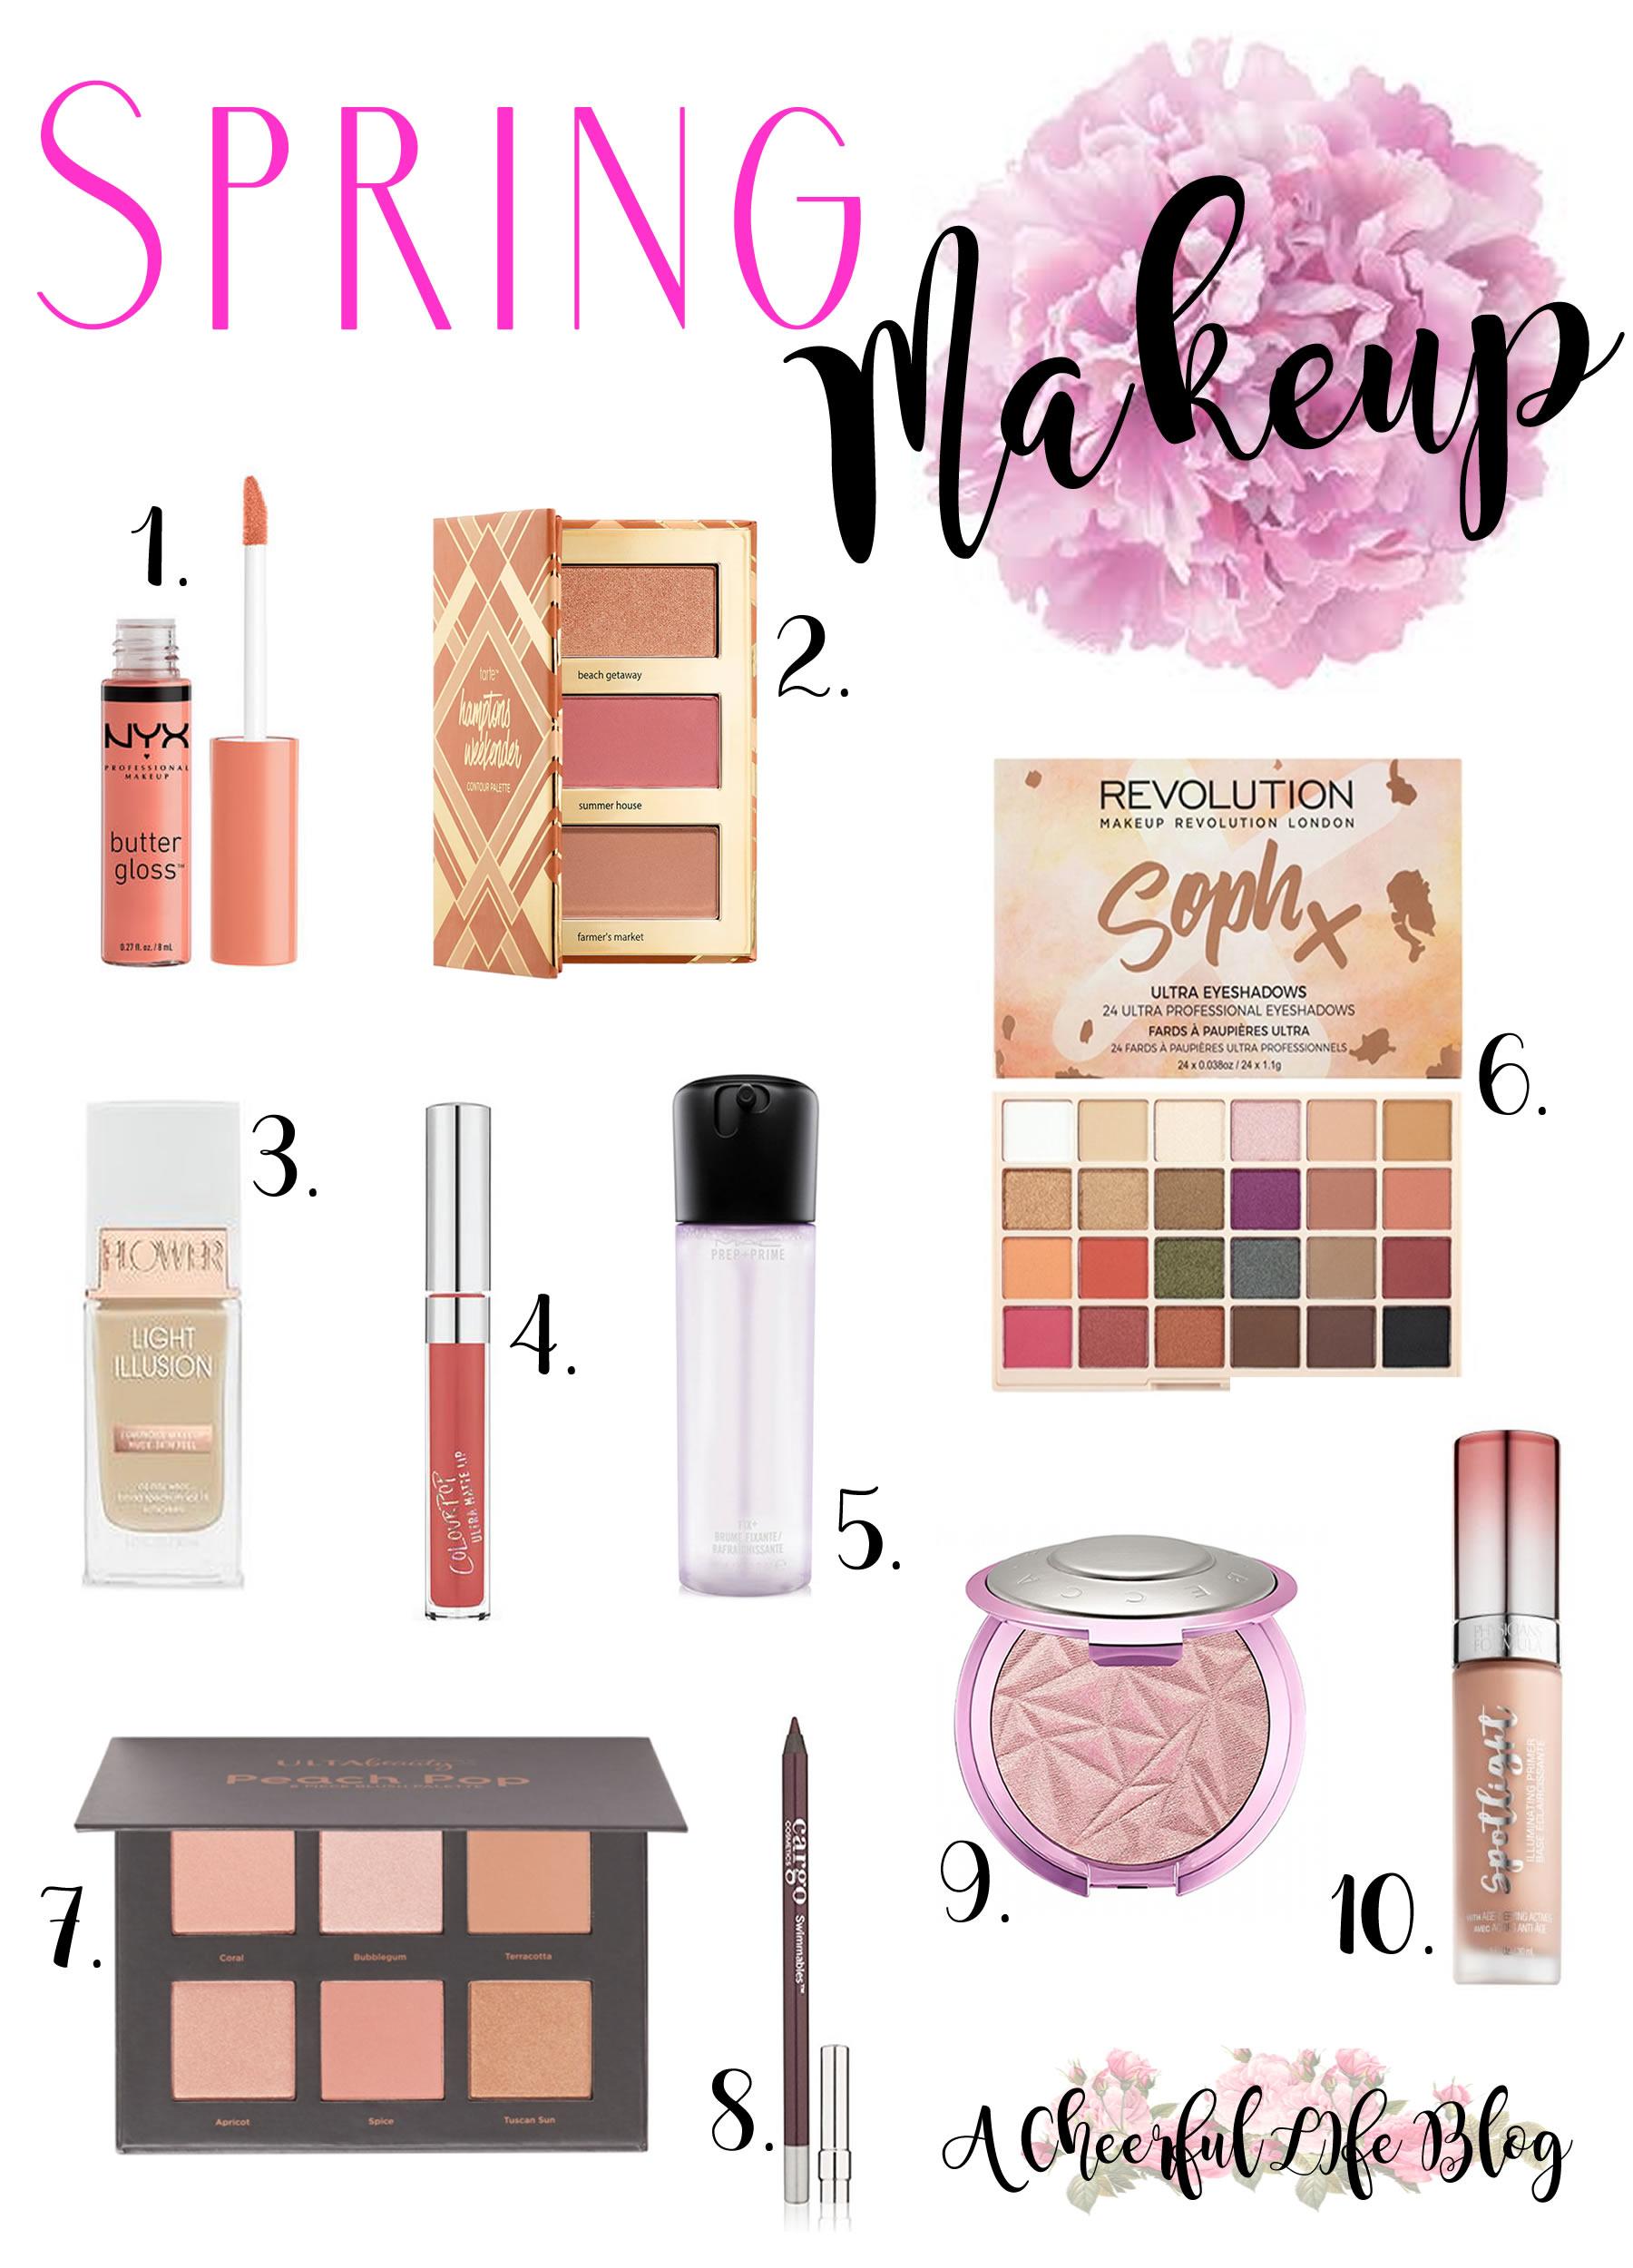 Spring Makeup A cheerful life blog